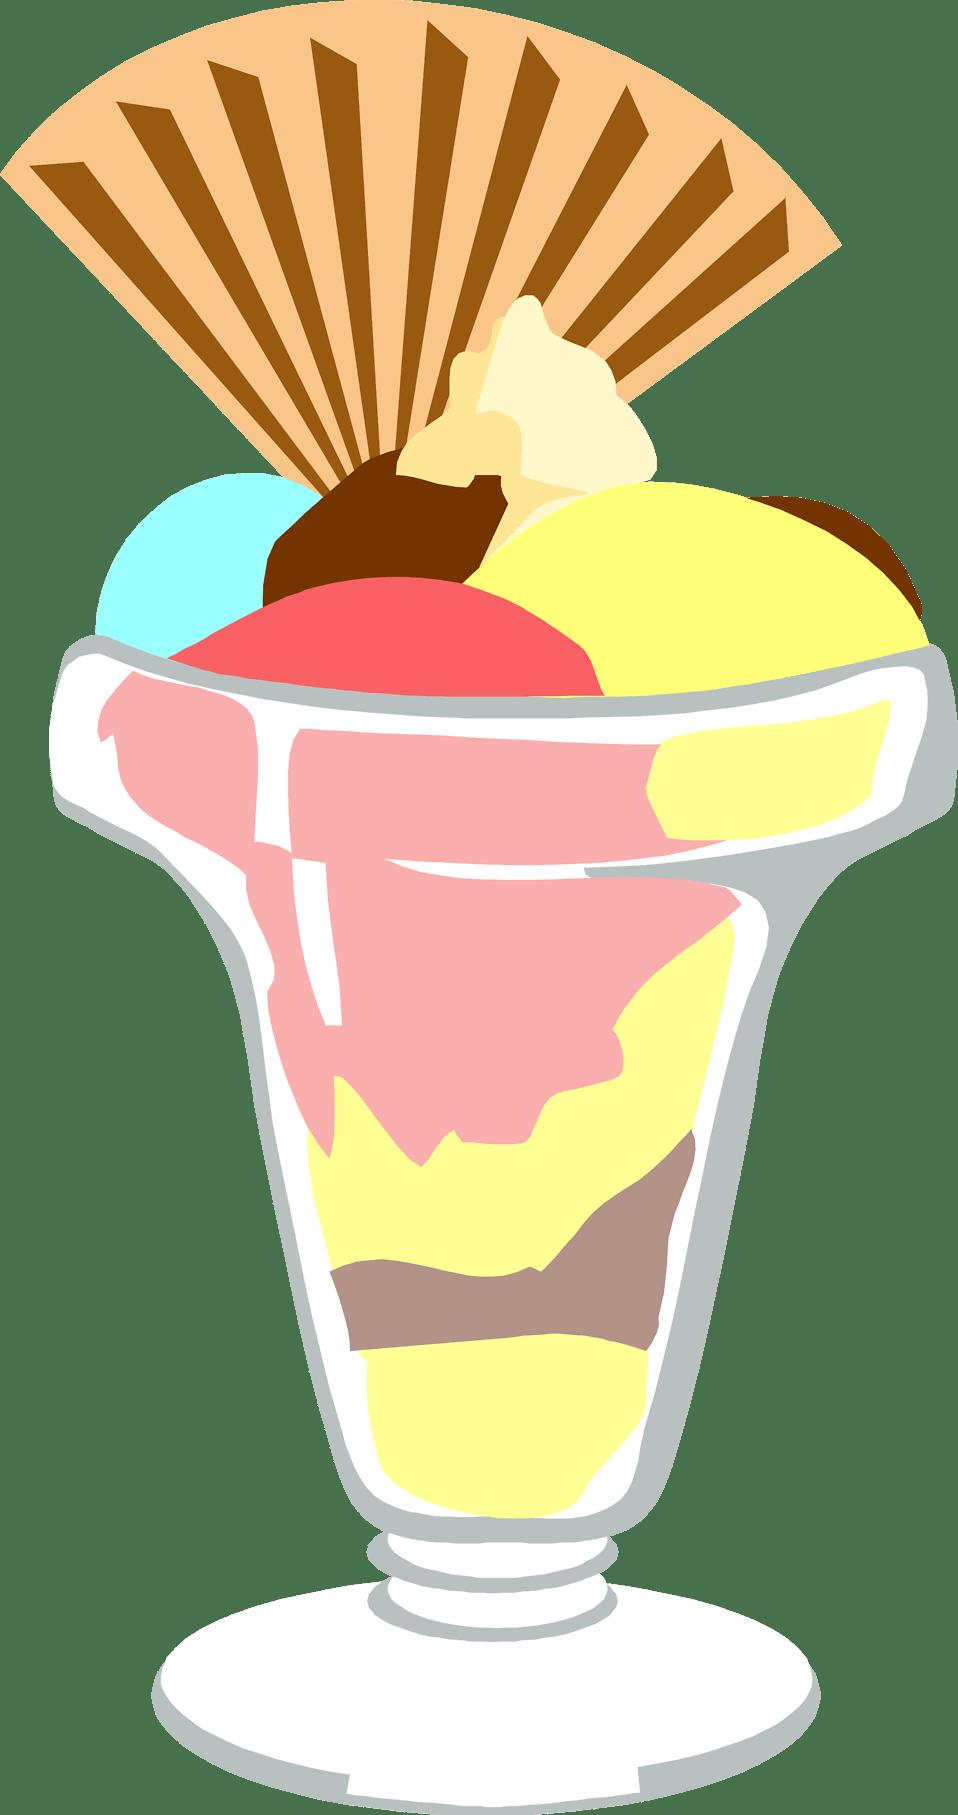 Sundae | Free Stock Photo | Illustration of an ice cream ...